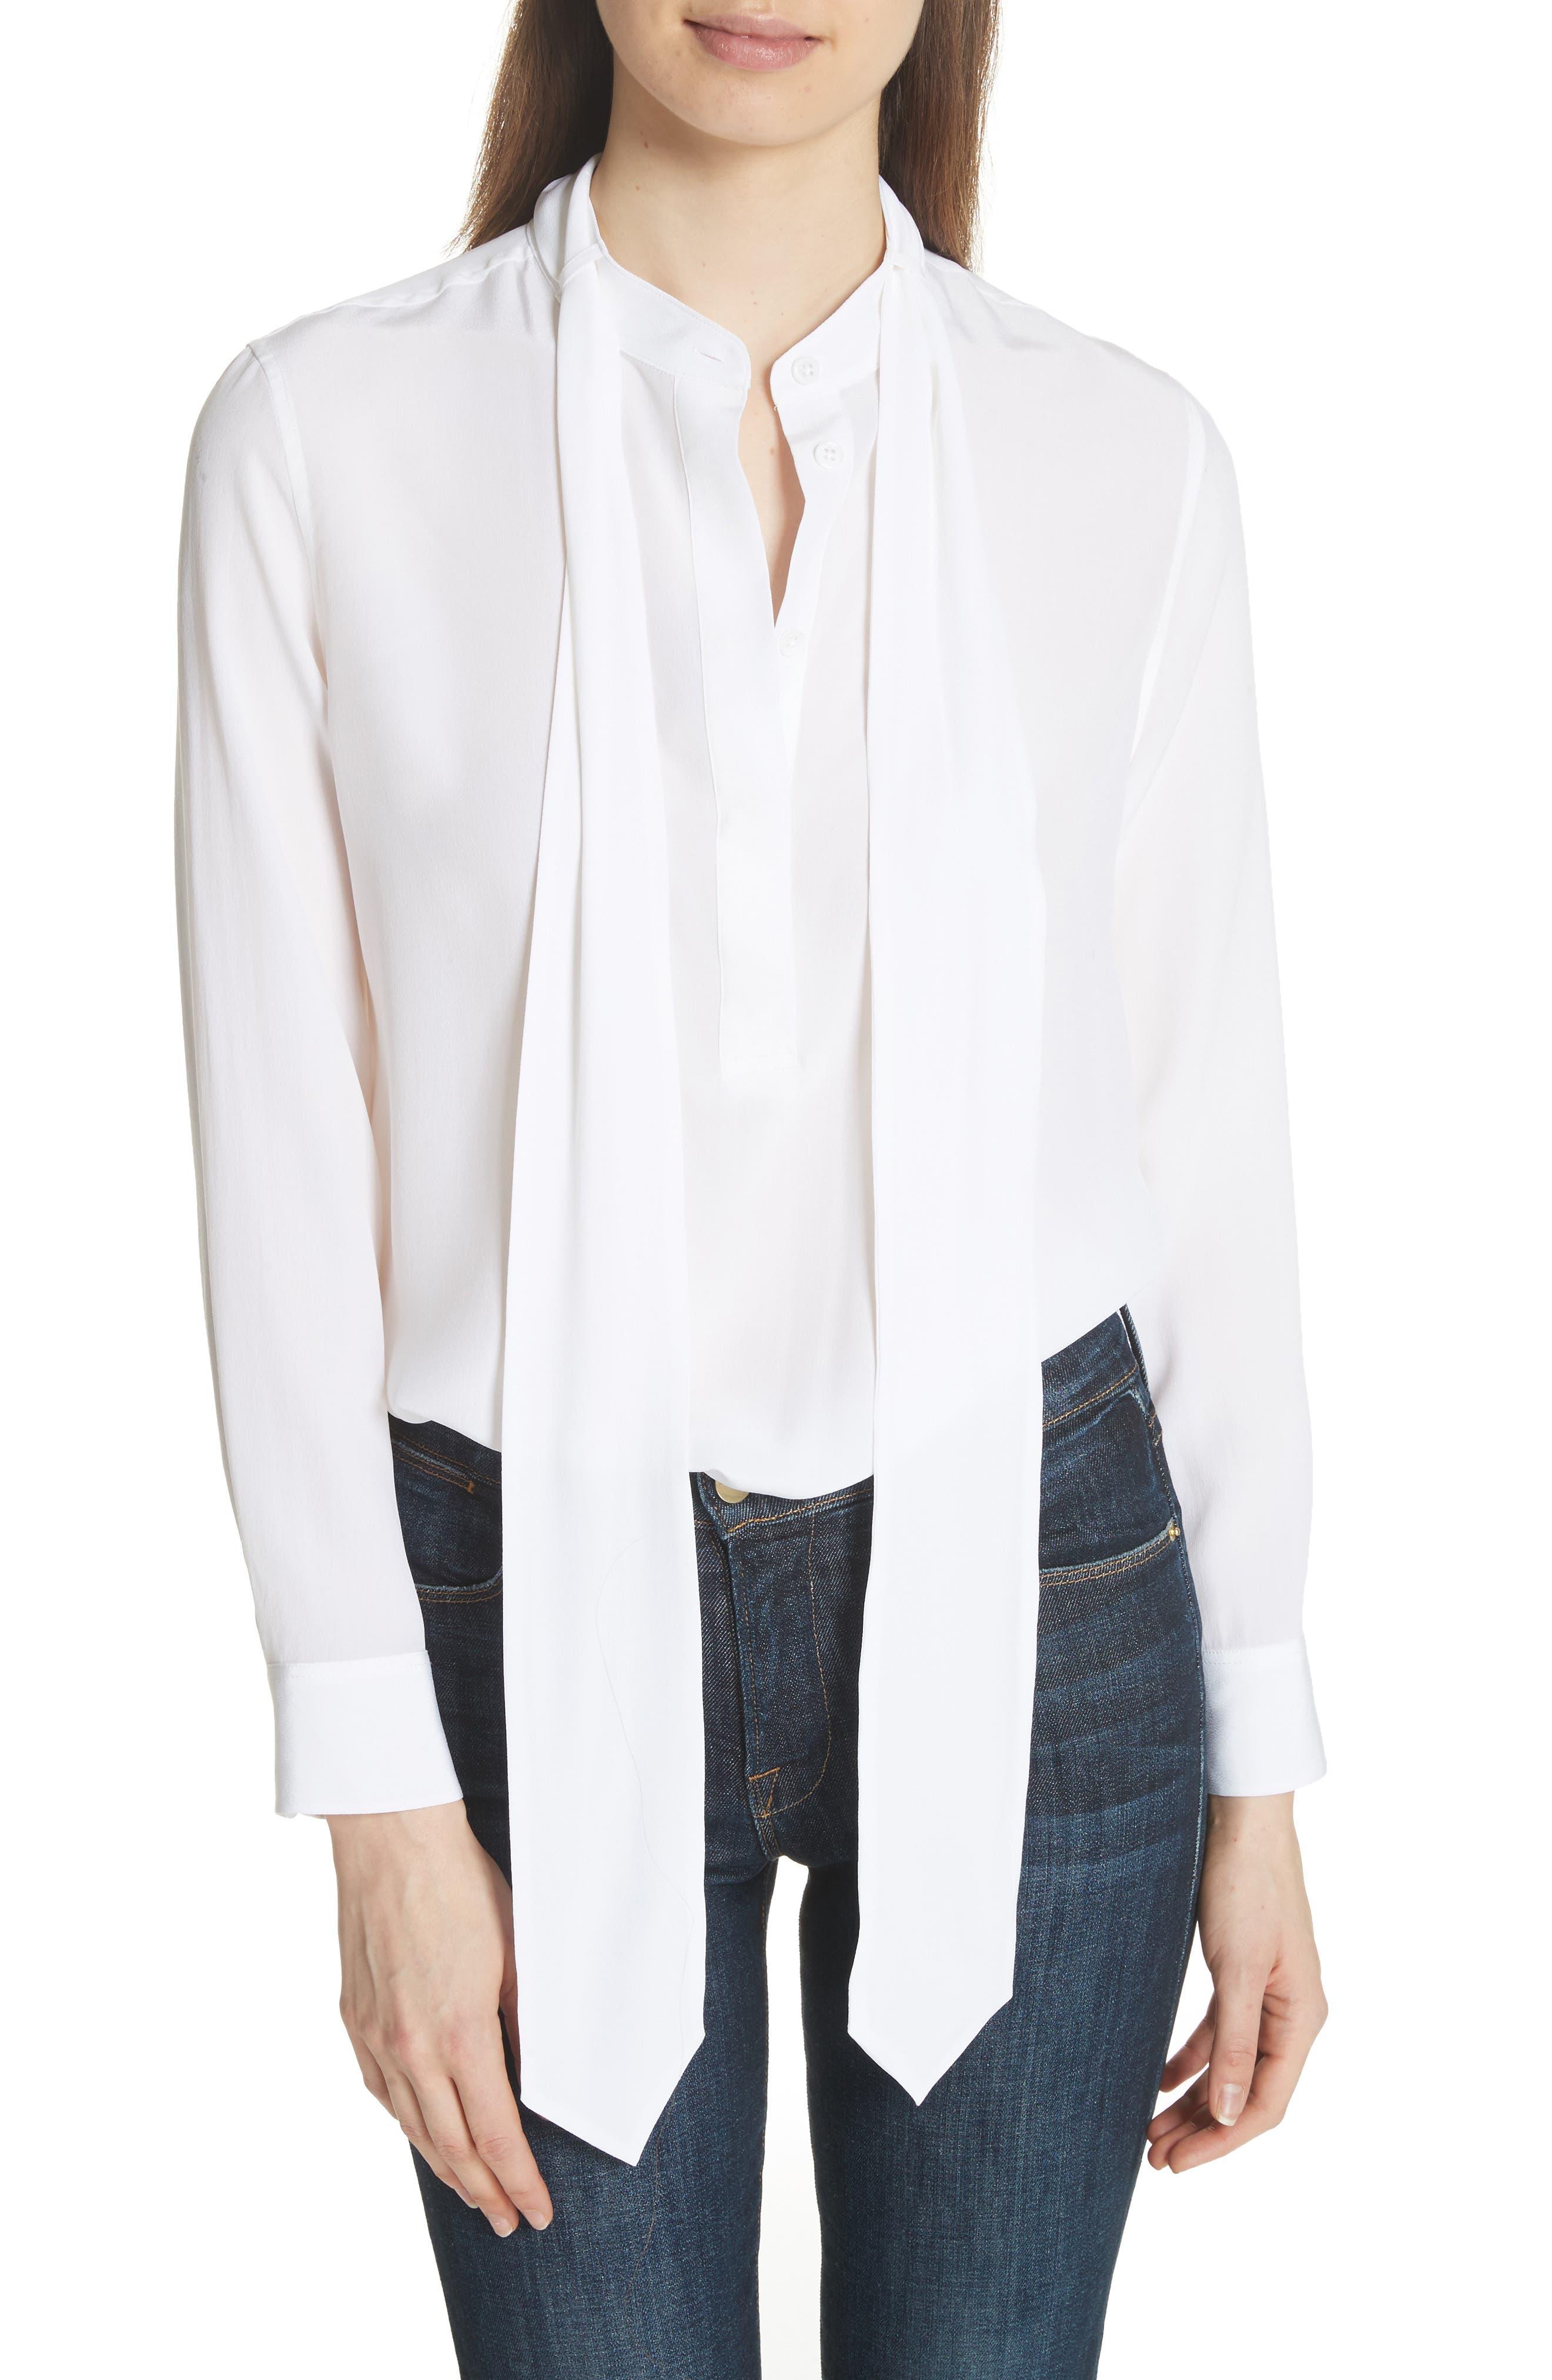 nike blazer womens white blouses